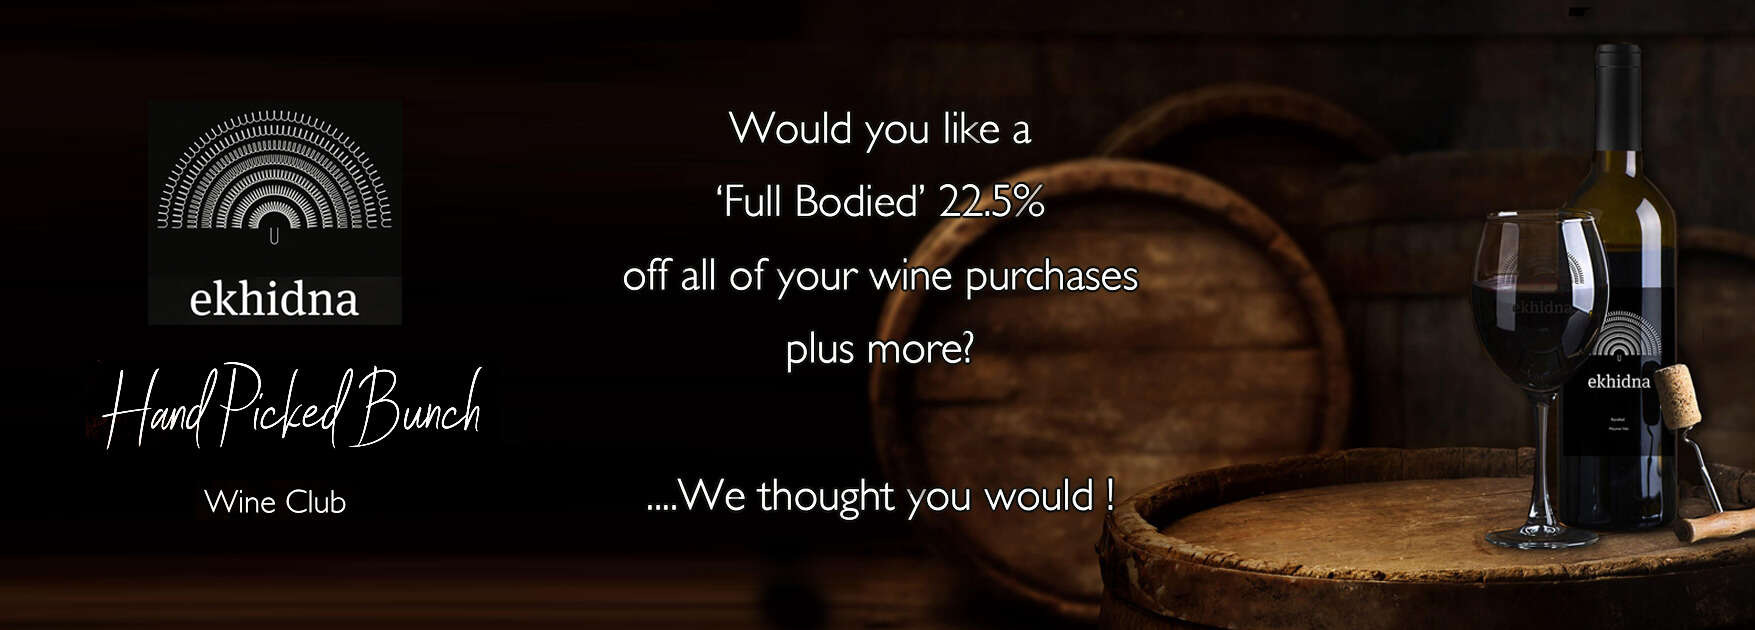 Hand Picked Bunch Wine Club - Ekhidna Wines